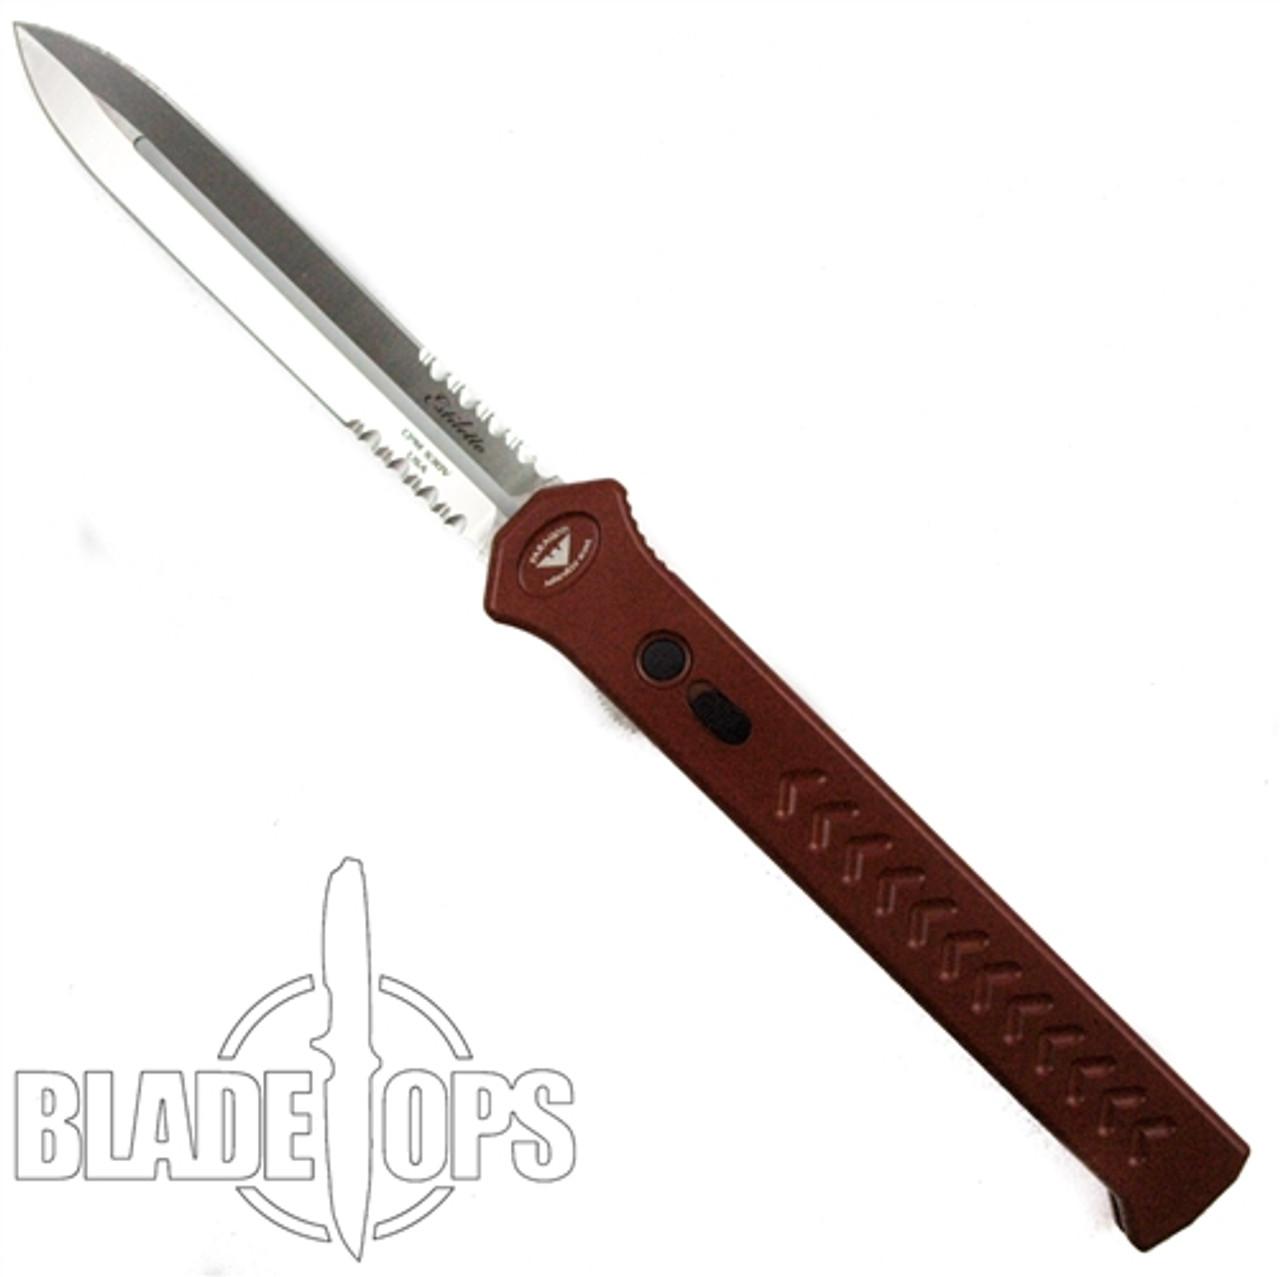 Paragon Red Estiletto OTF Auto Knife, Satin Combo Edge Dagger Blade